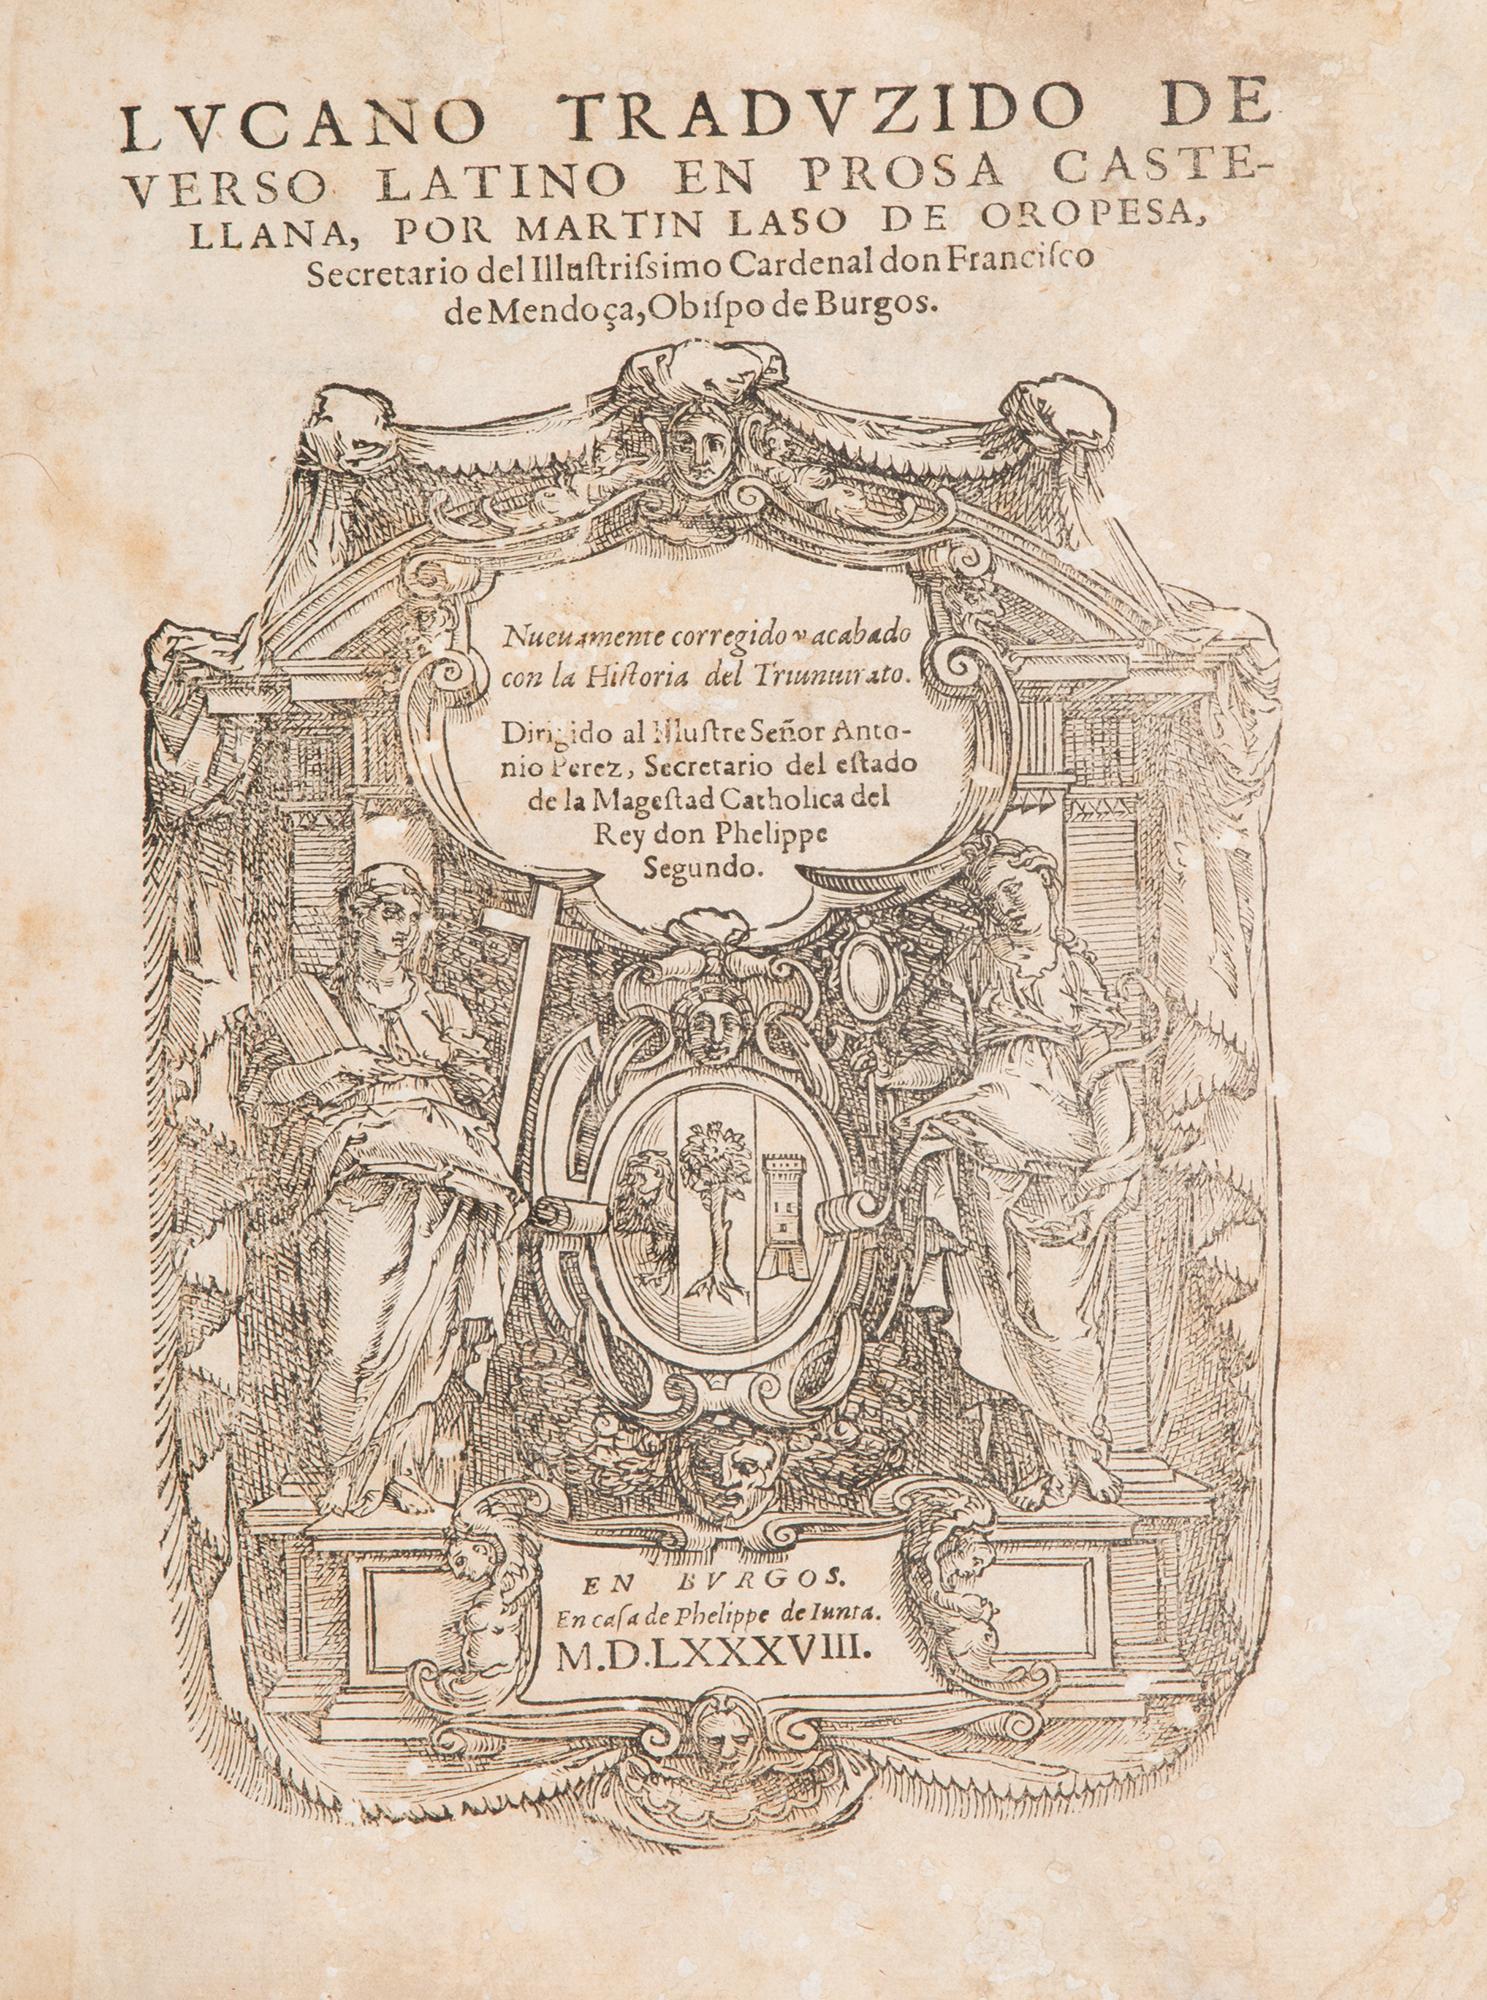 Lucano Traduzido de verso latino en prosa castellana, por Martin Laso de Oropesa